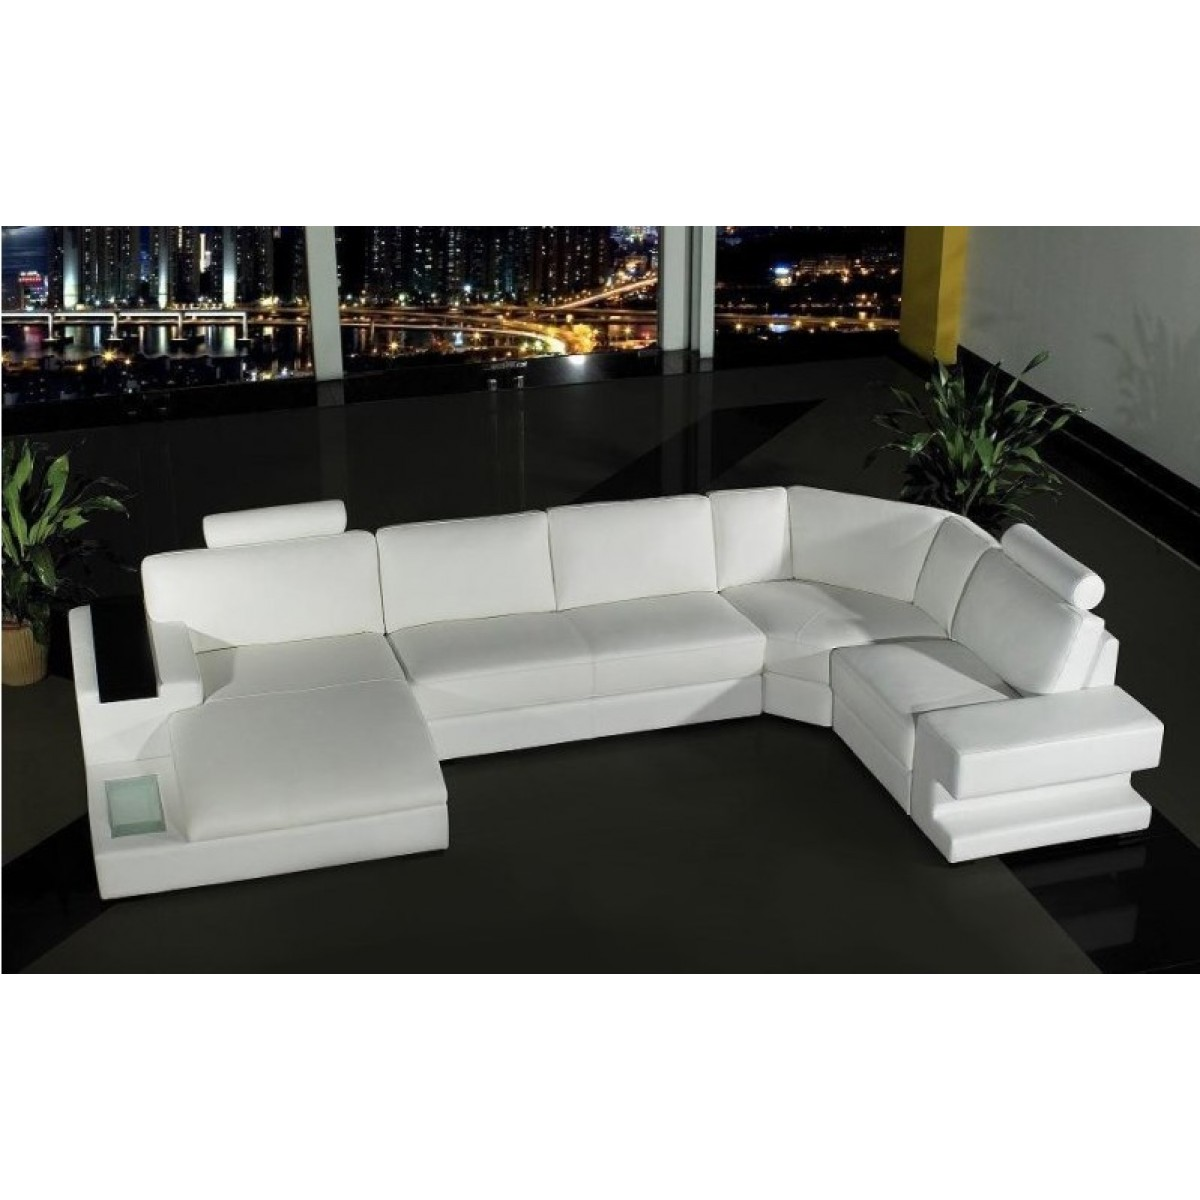 canap d 39 angle panoramique en cuir v ritable phoenix pop. Black Bedroom Furniture Sets. Home Design Ideas